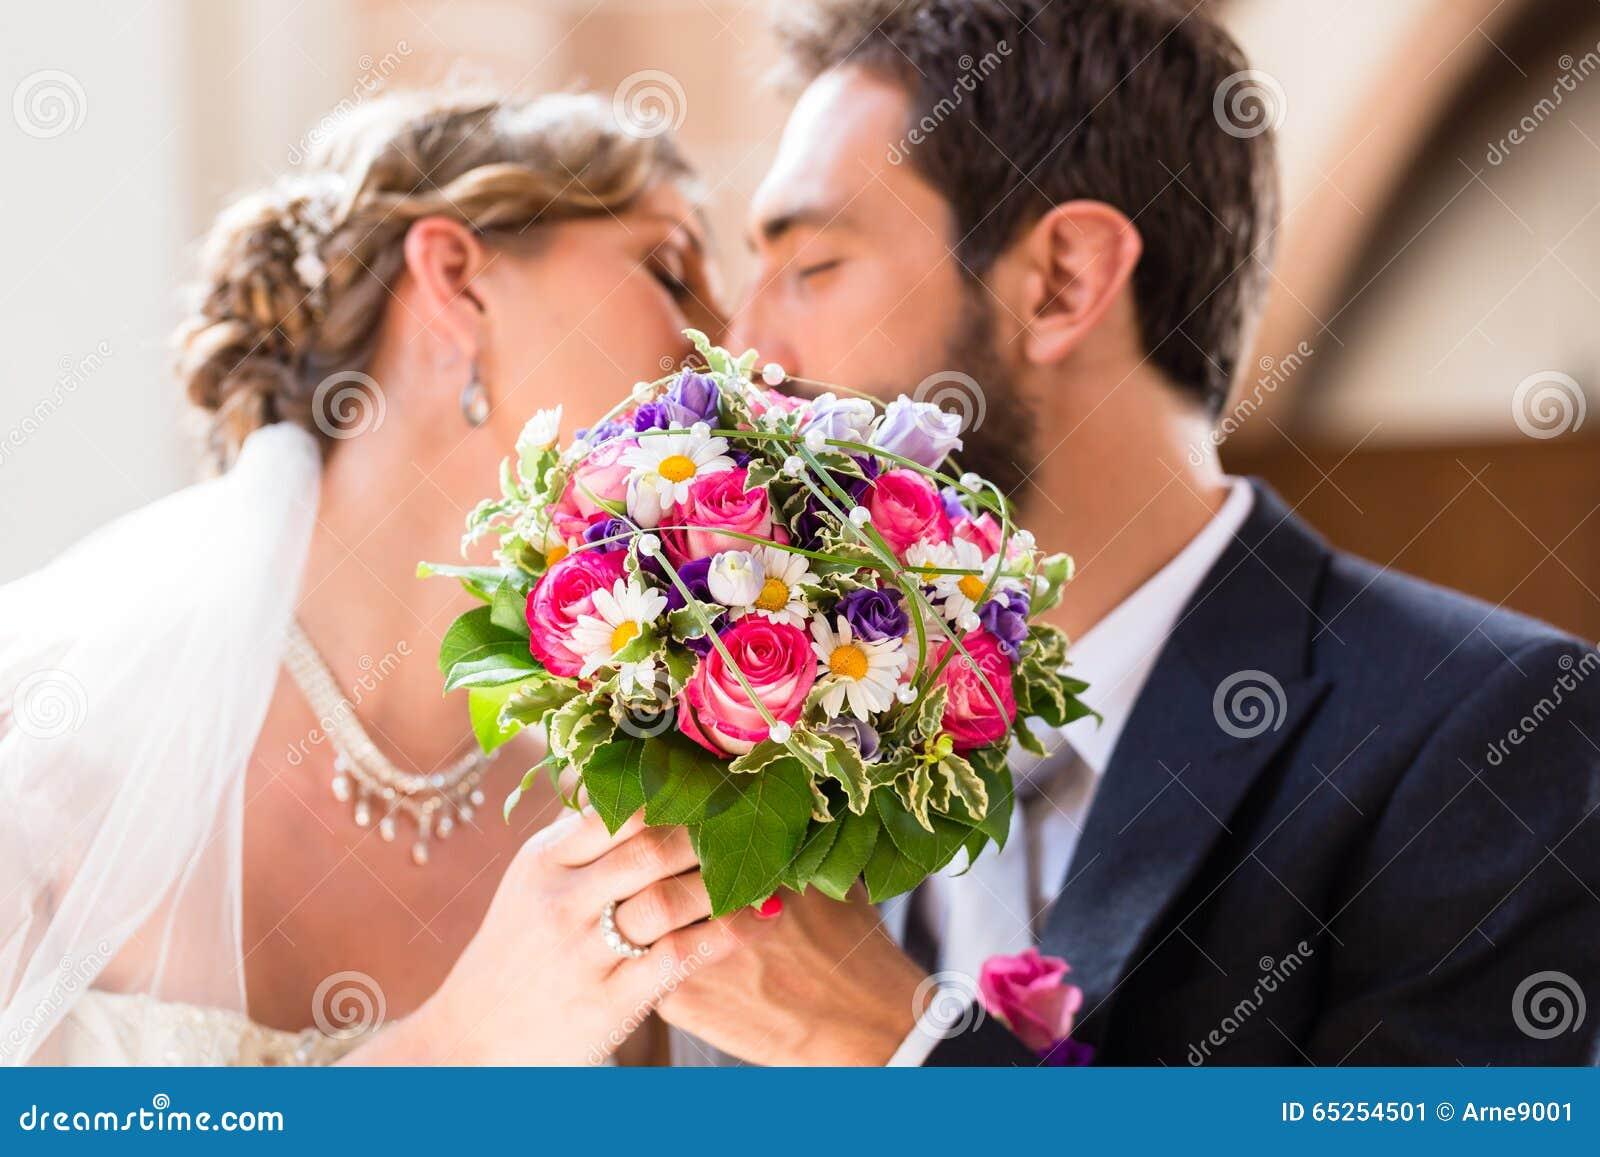 wedding couple and kiss stock photo - image: 42019495